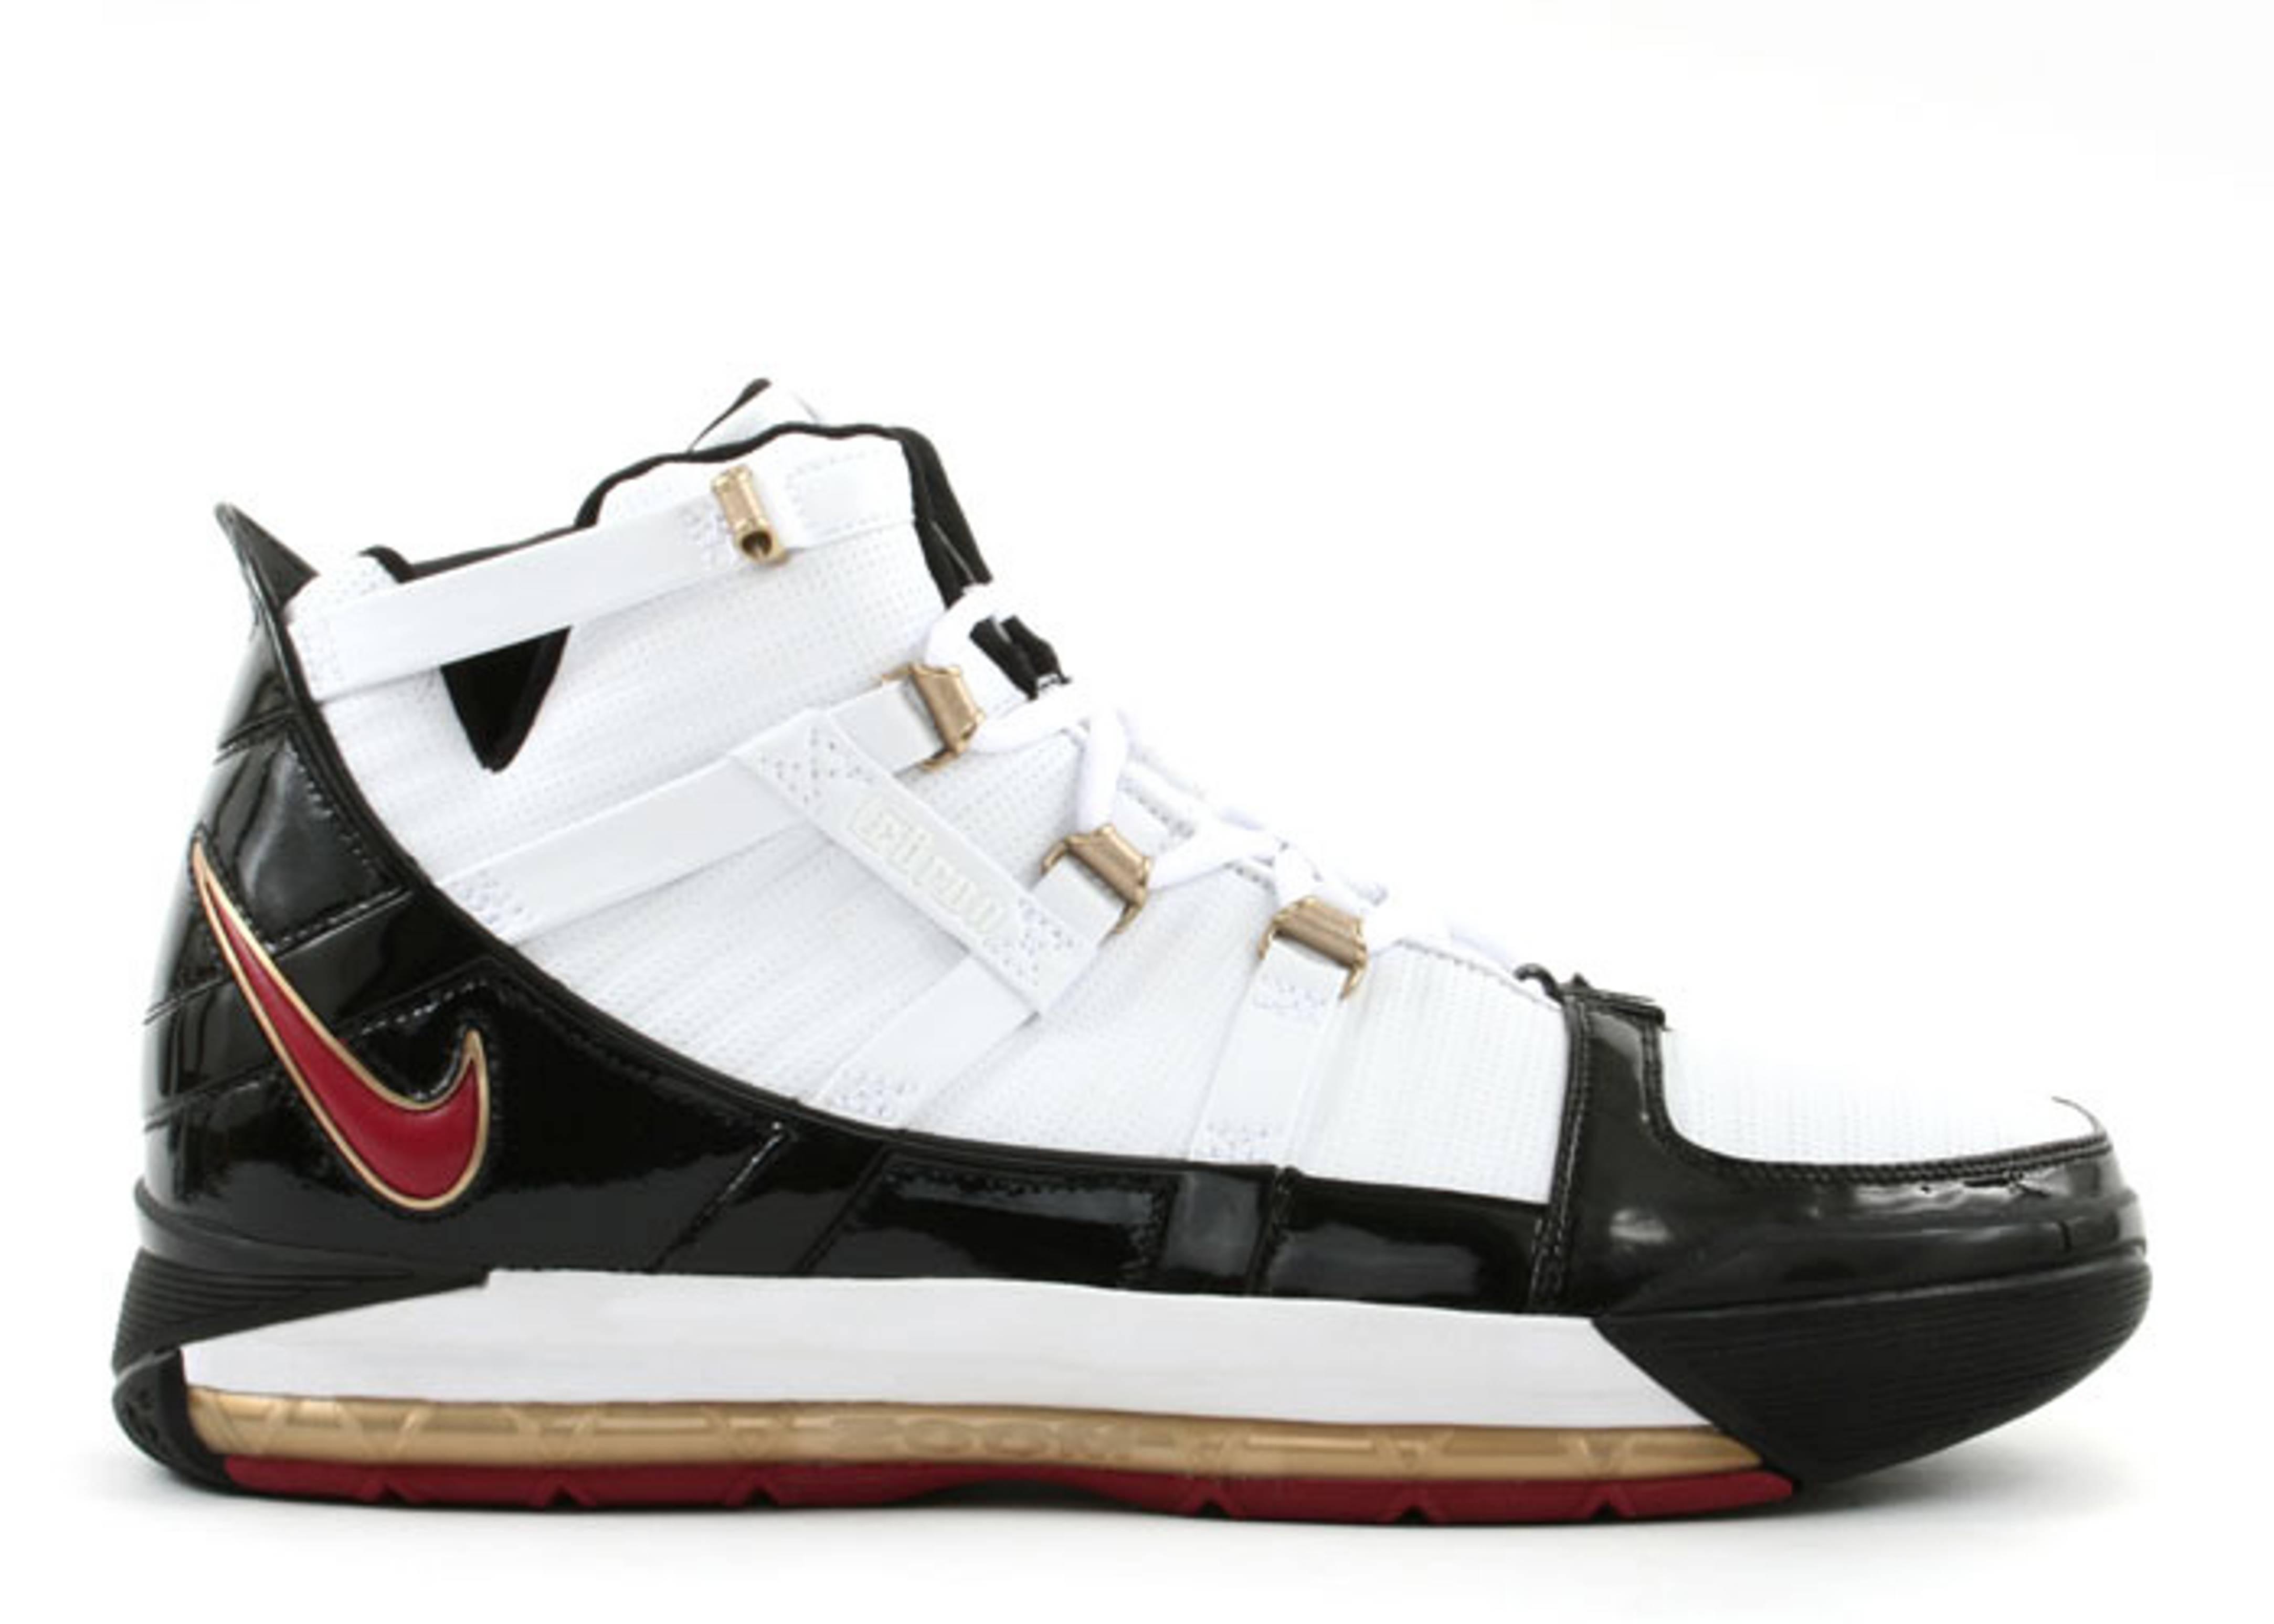 Pre-owned Nike Zoom Lebron 3 White Black Crimson Size 10.5